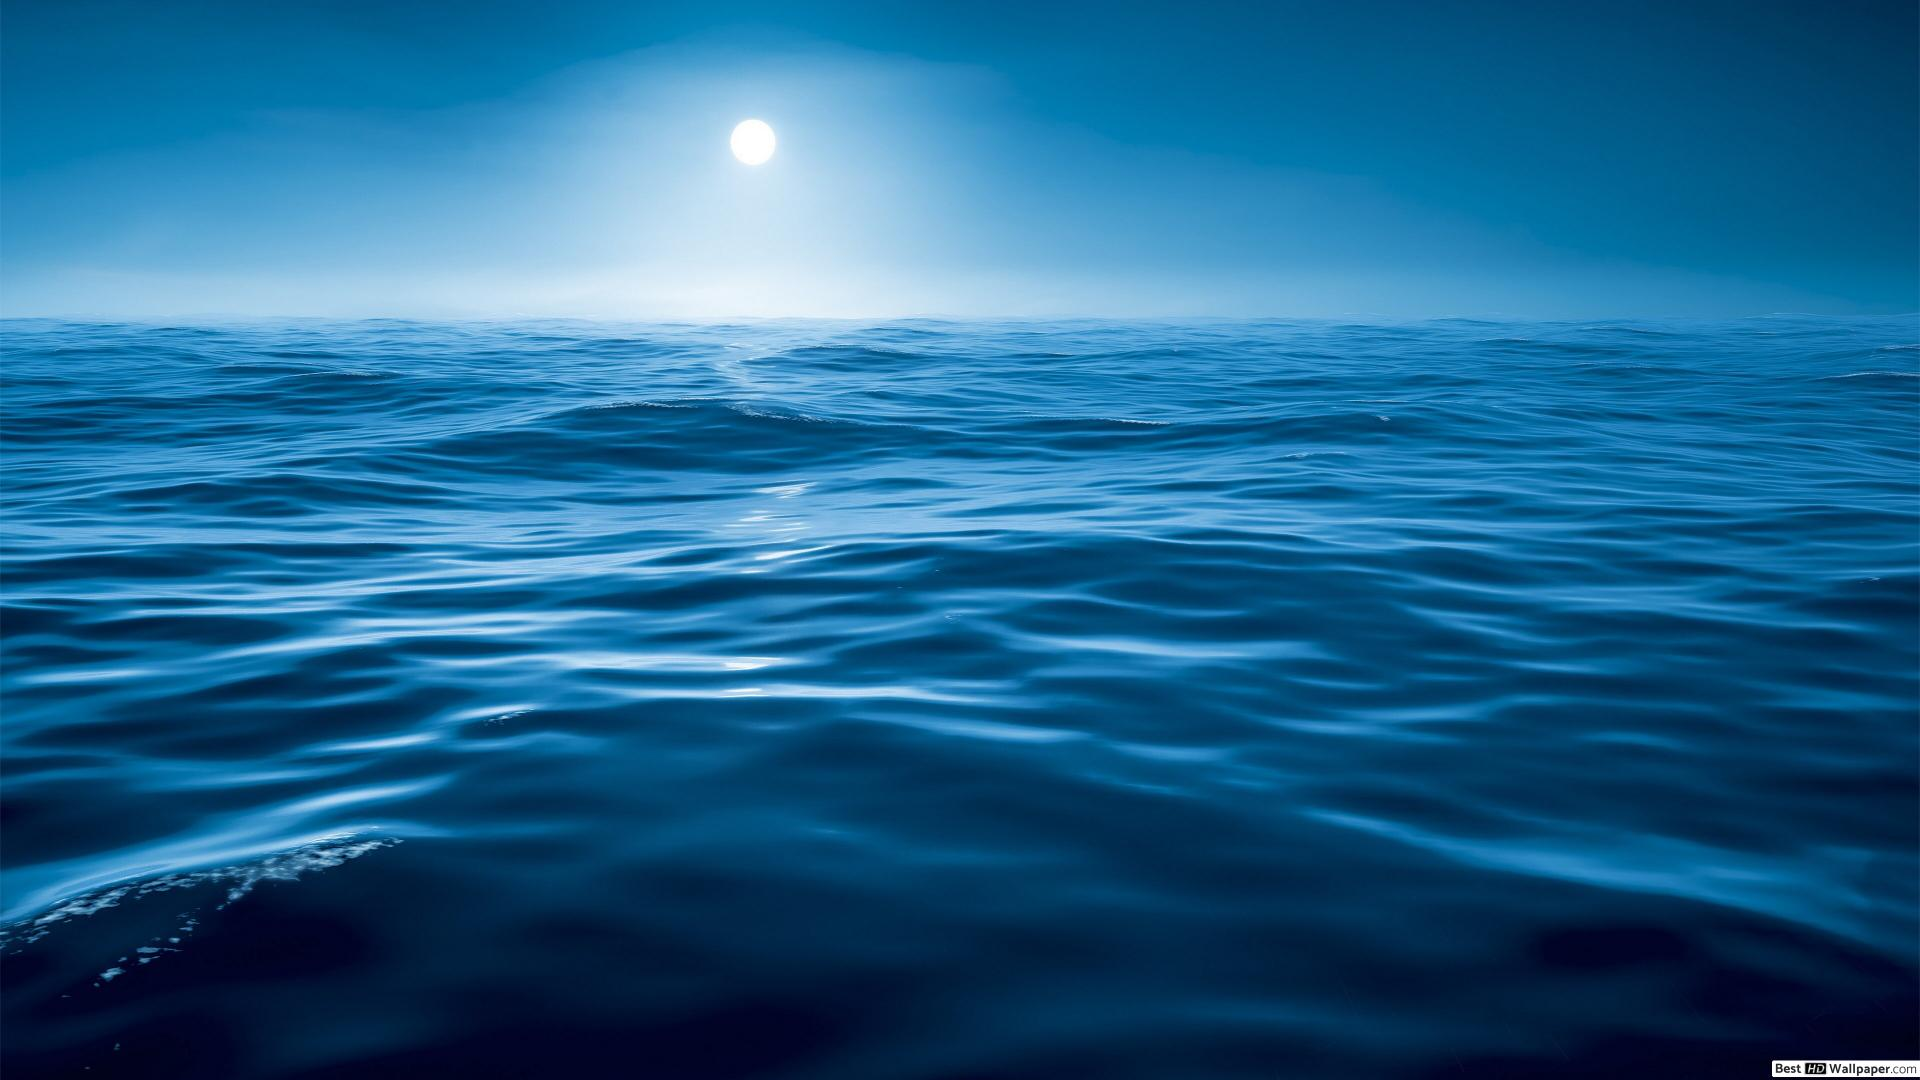 El mar profundo